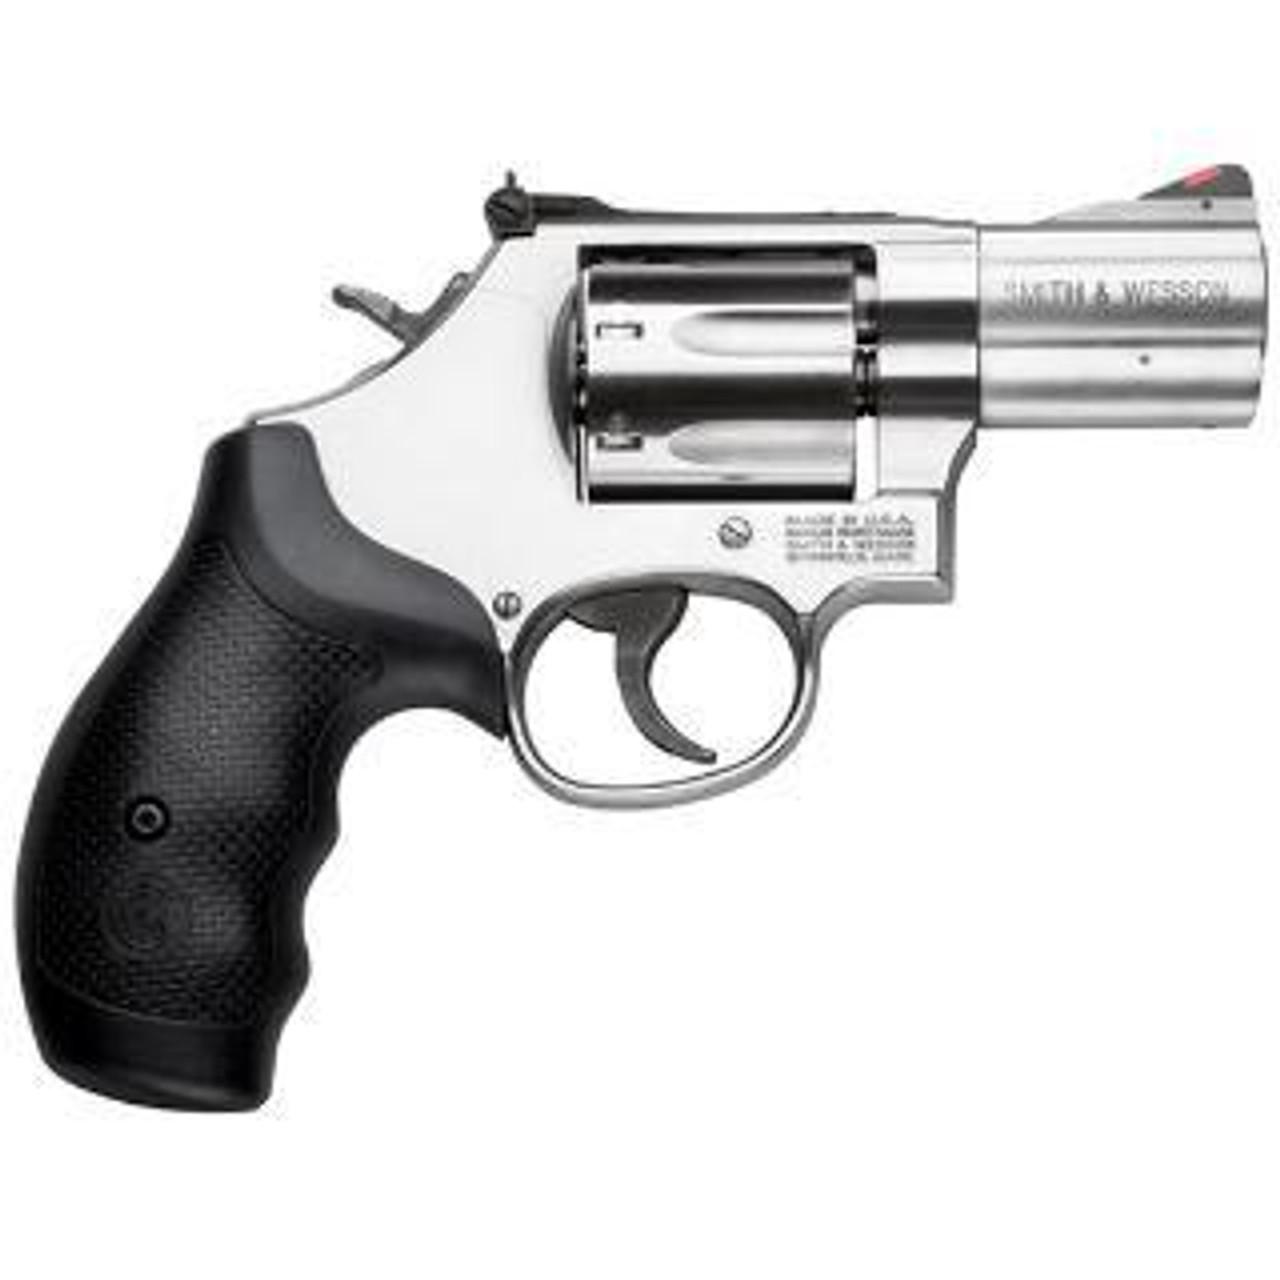 "Smith & Wesson 686+ 2.5"" - California Legal .357"